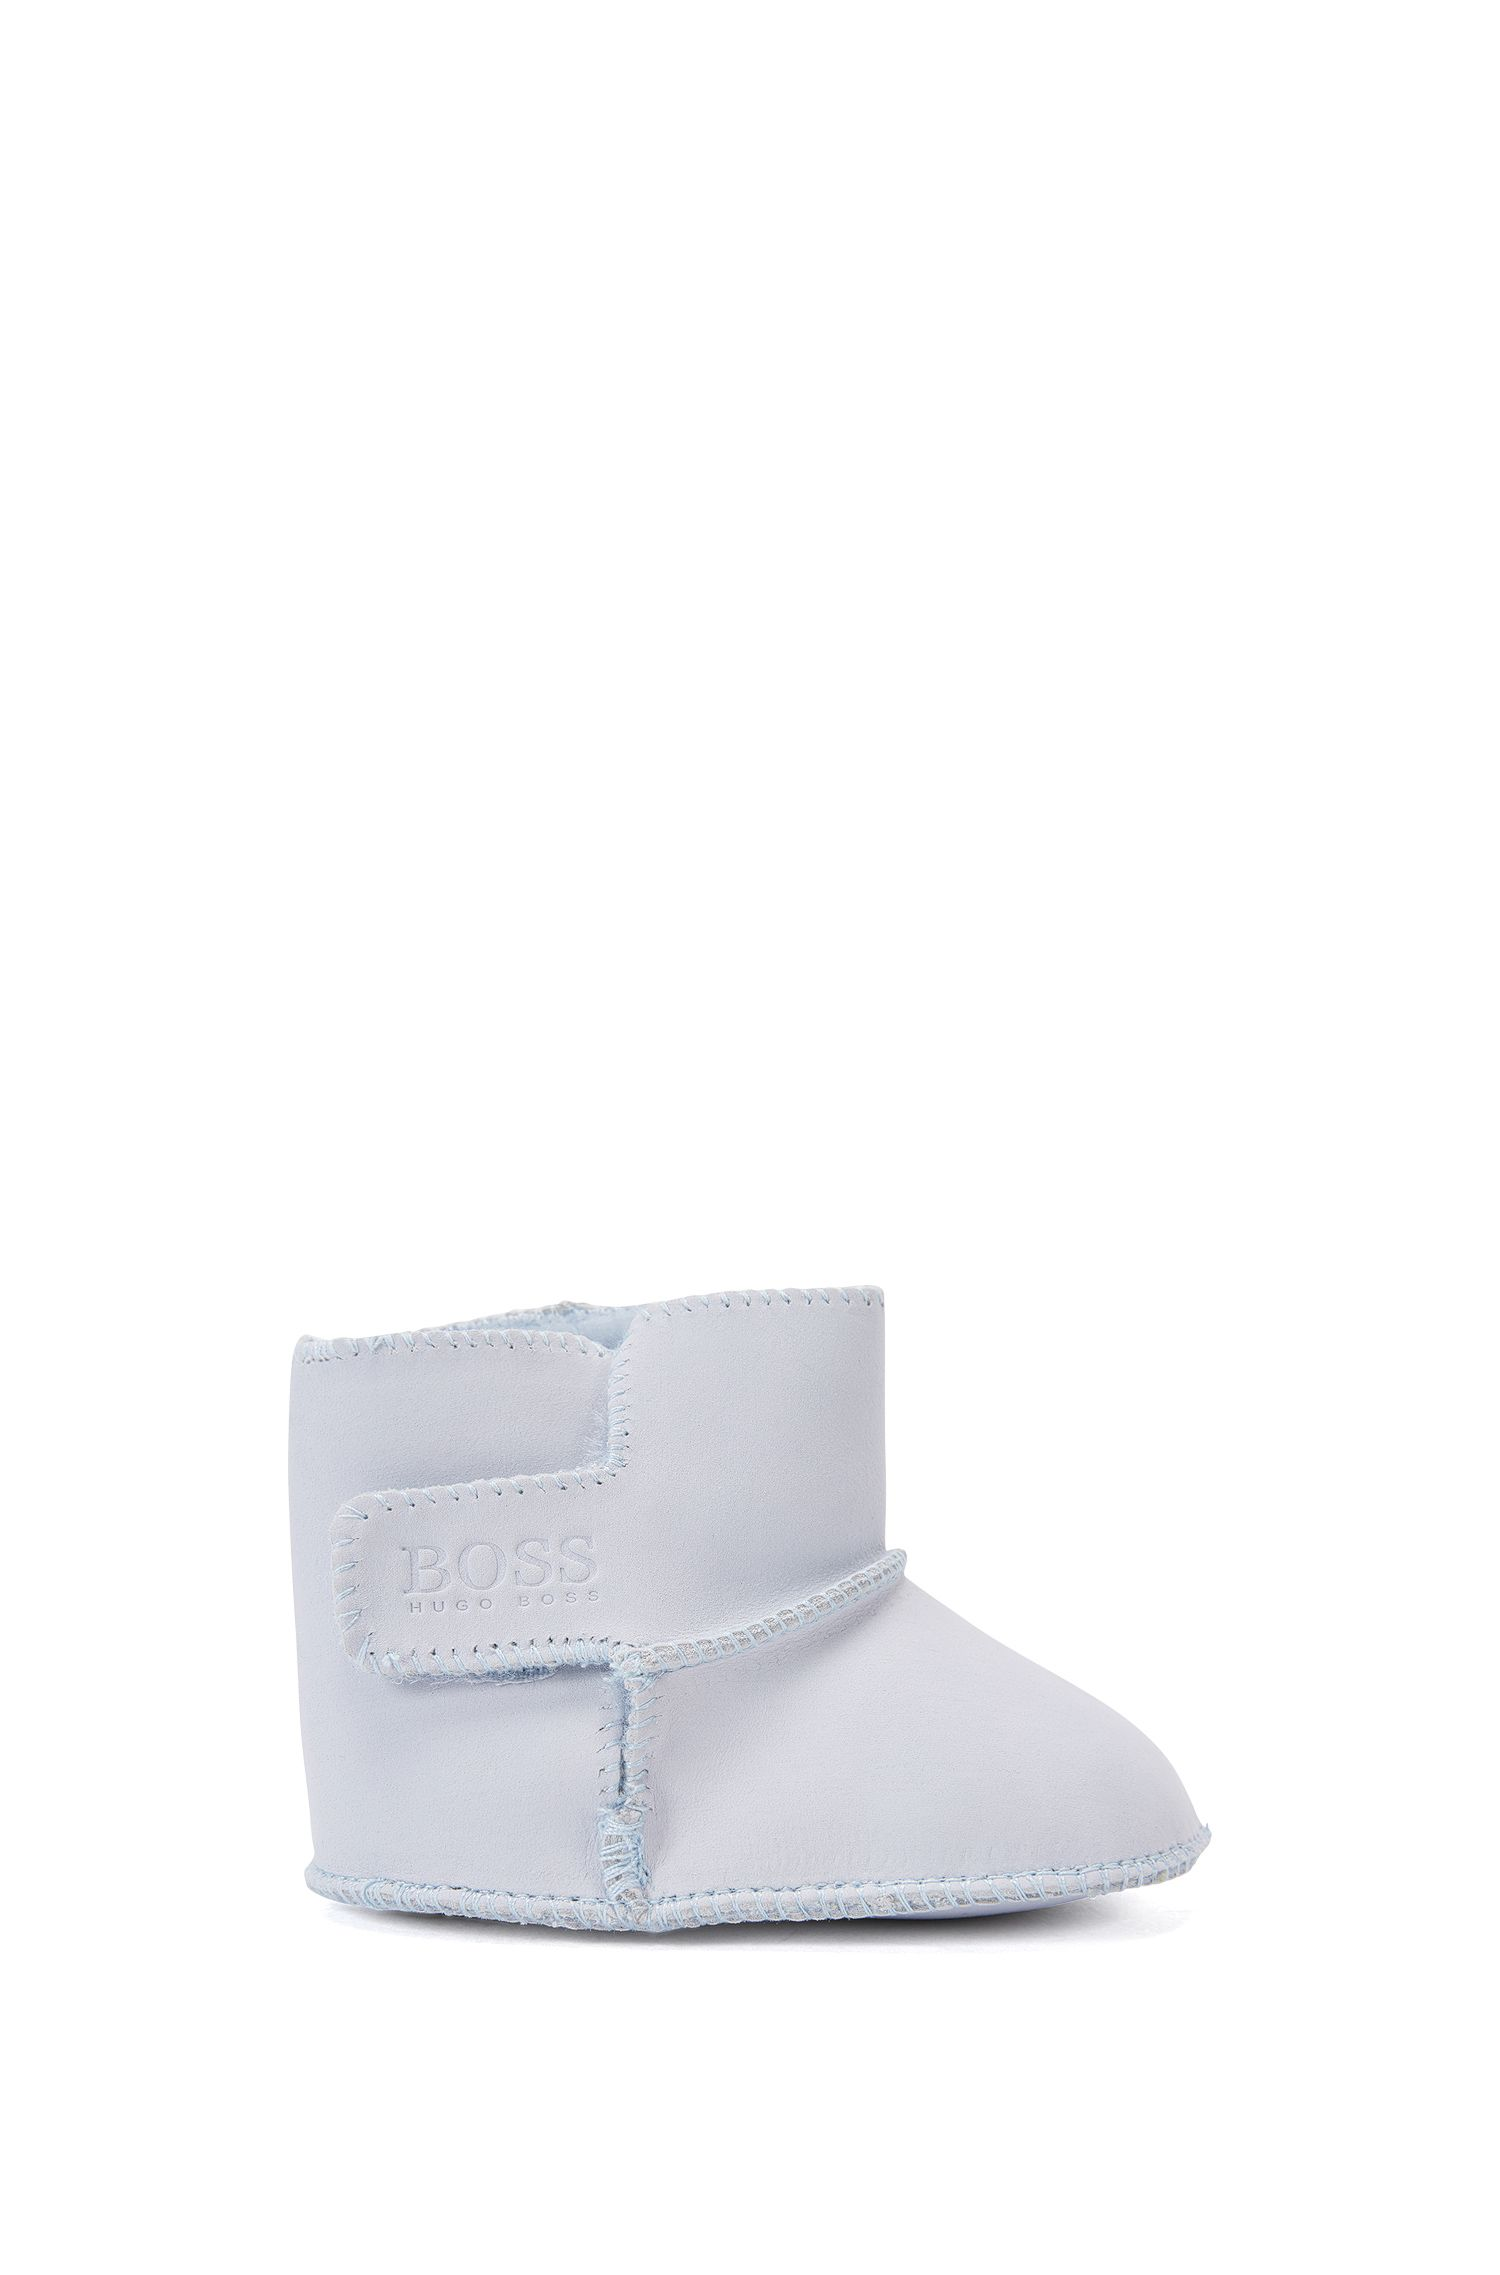 'J99048' | Newborn Cotton Booties, Light Blue